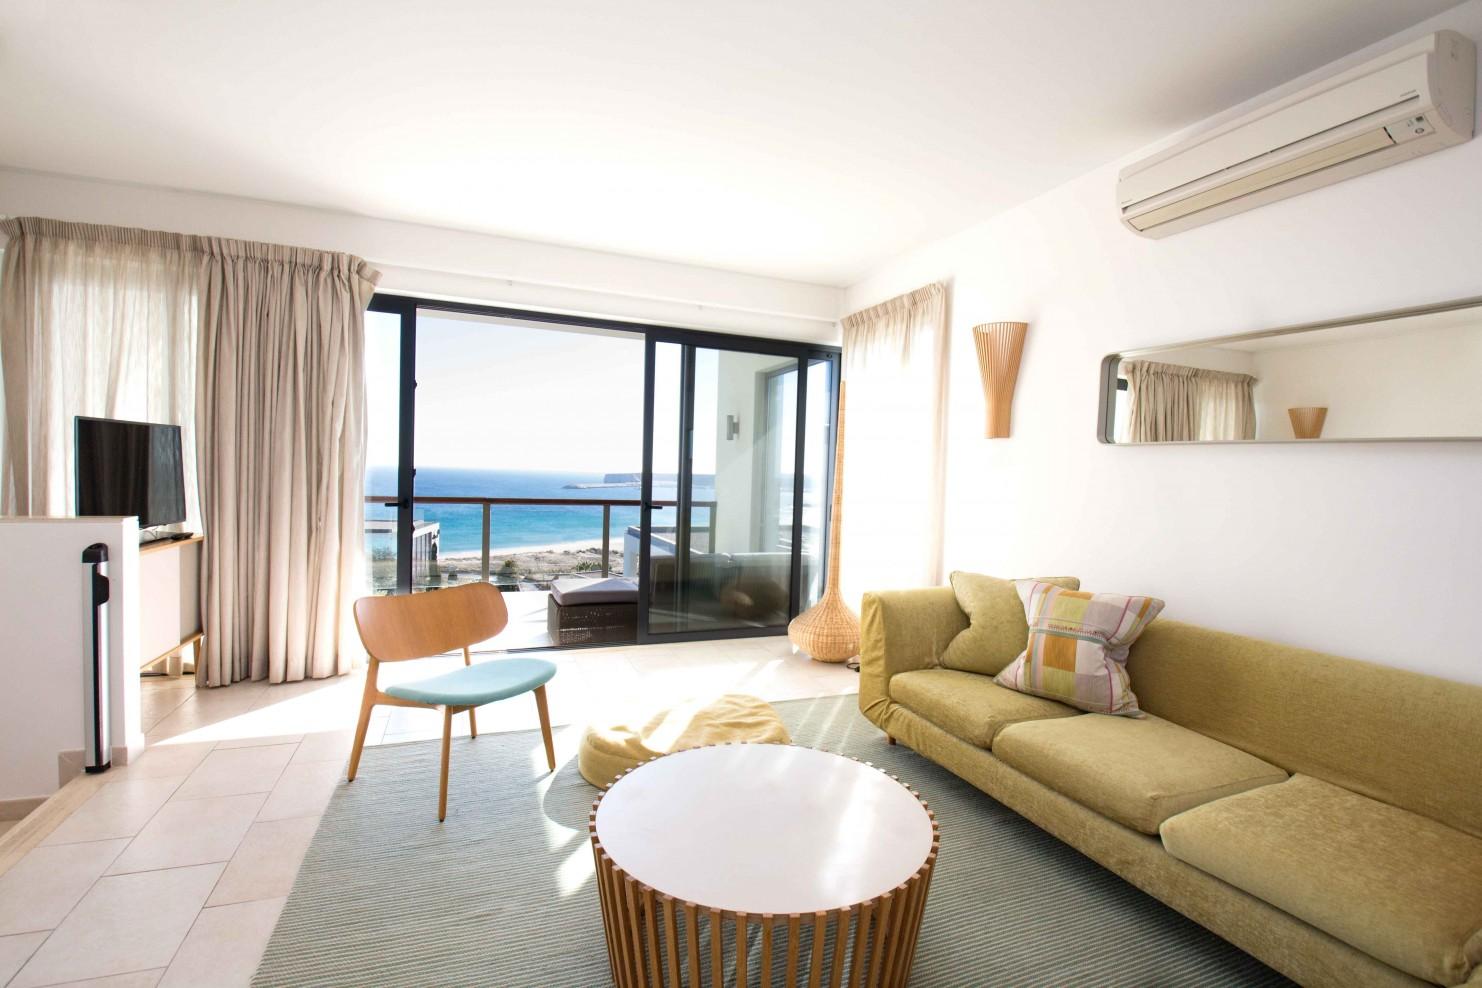 Private Villas In Portugal the best luxury villas & handpicked private rentals | mr